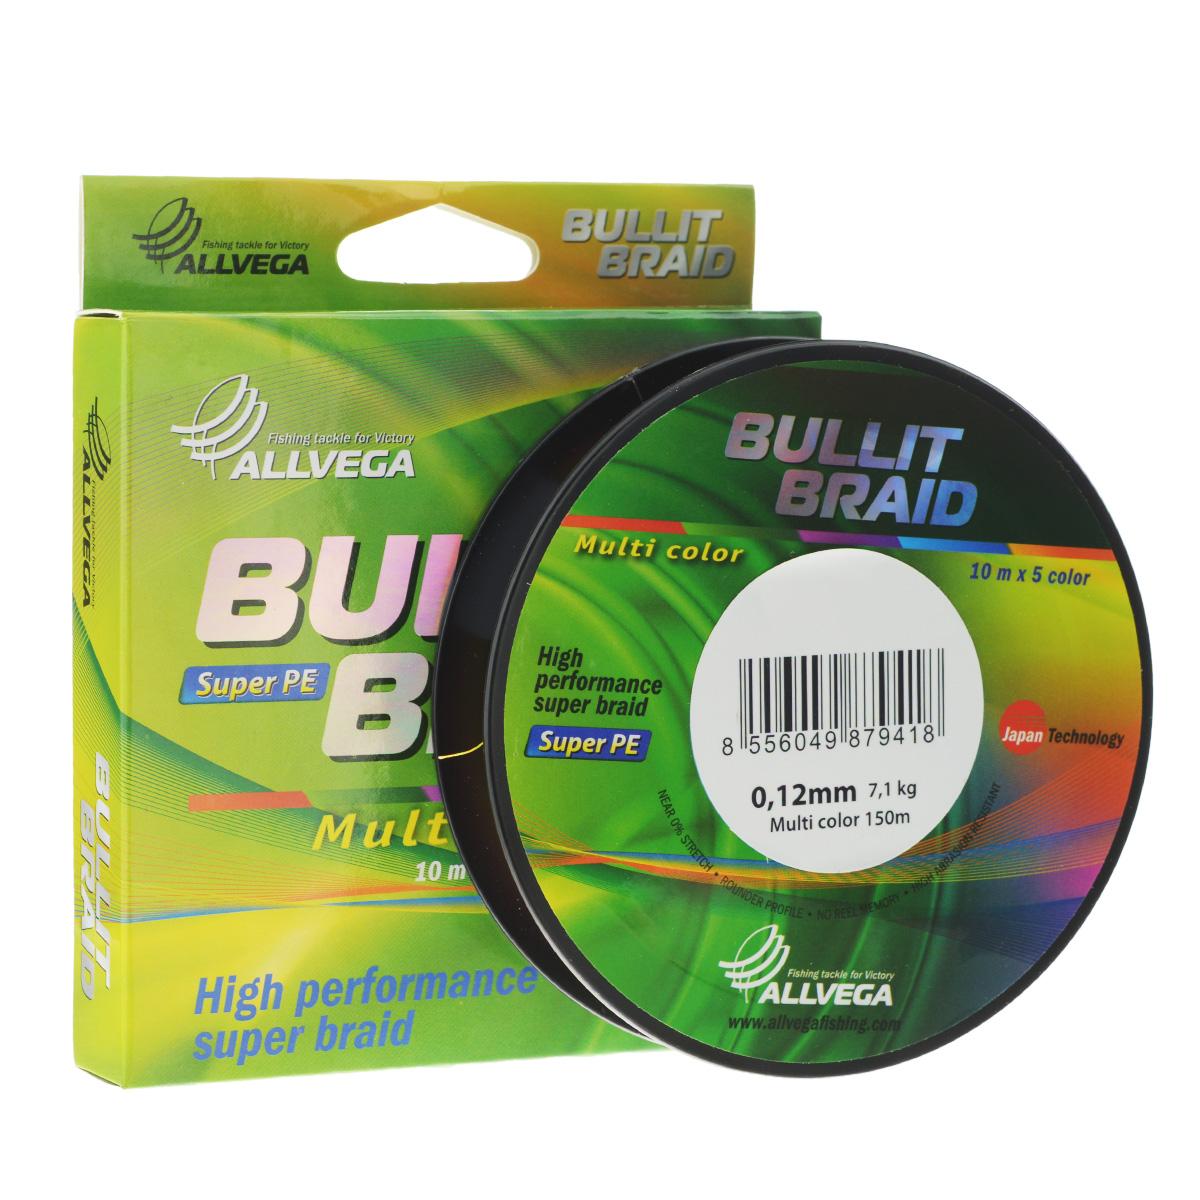 "Леска плетеная Allvega ""Bullit Braid"", цвет: мульти, 150 м, 0,12 мм, 7,1 кг 25836"